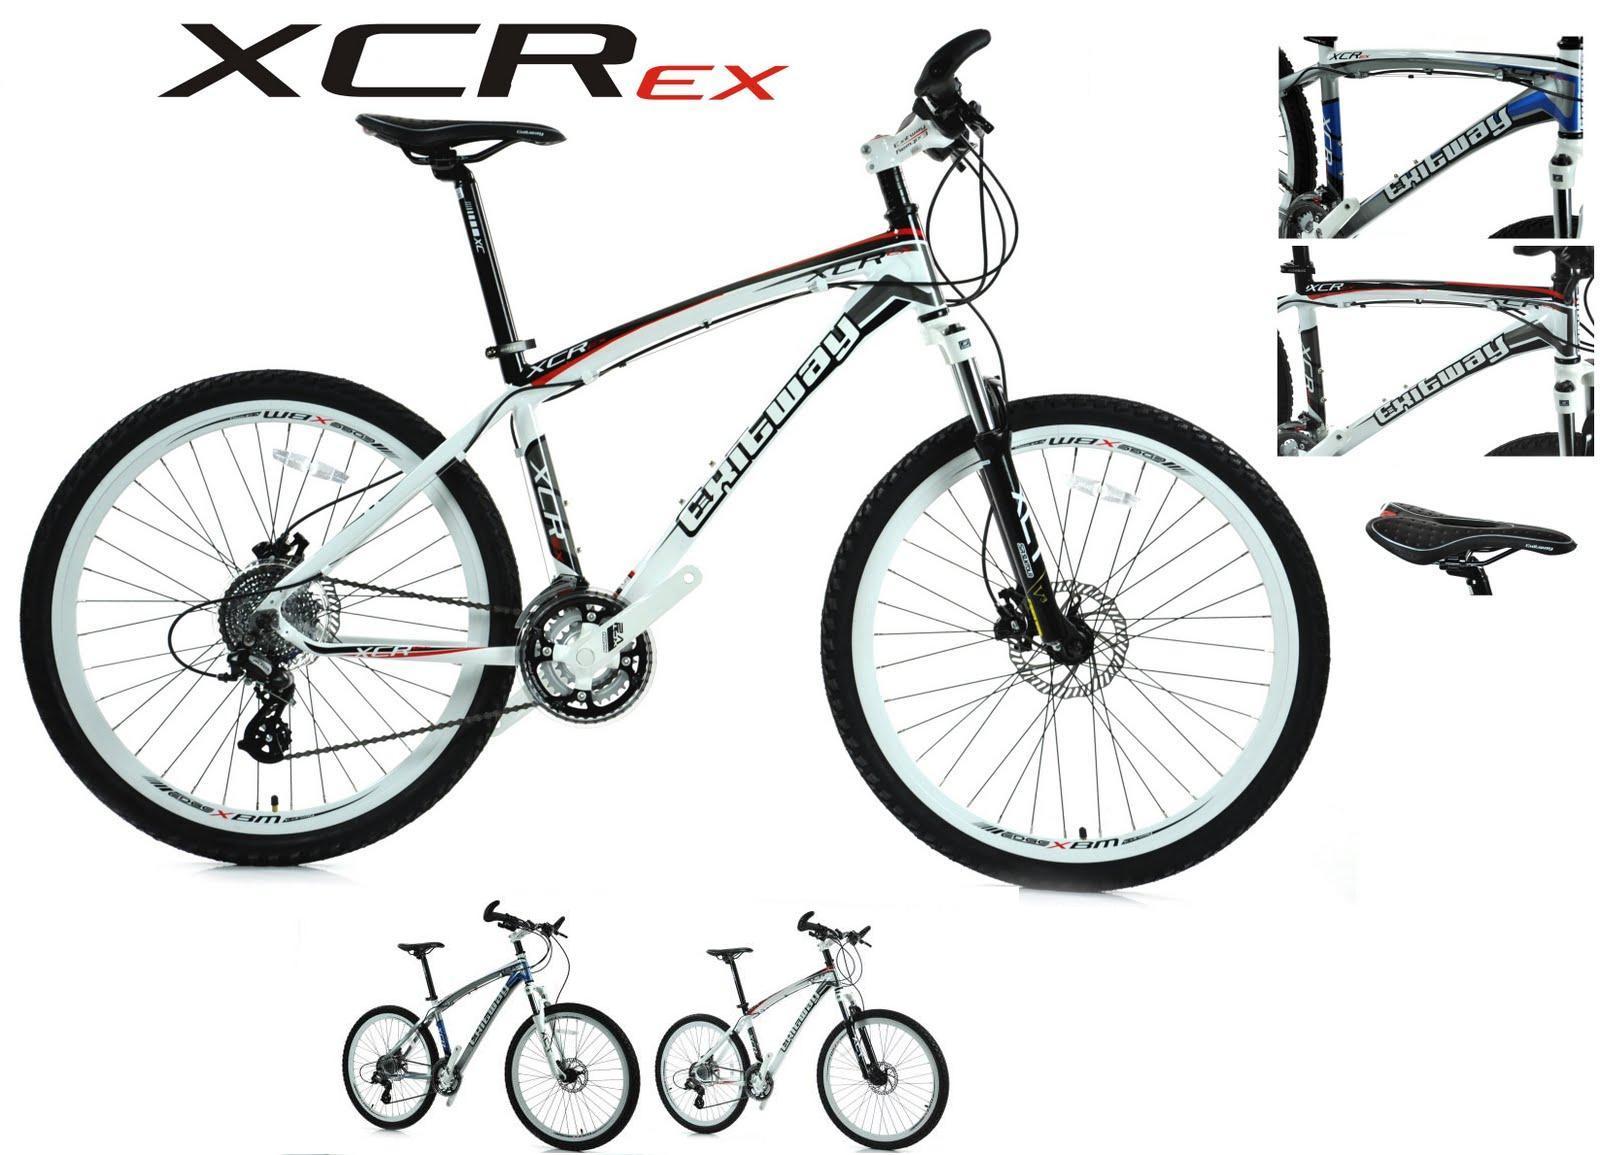 WAN'S CYCLE: Exitway XCR EX